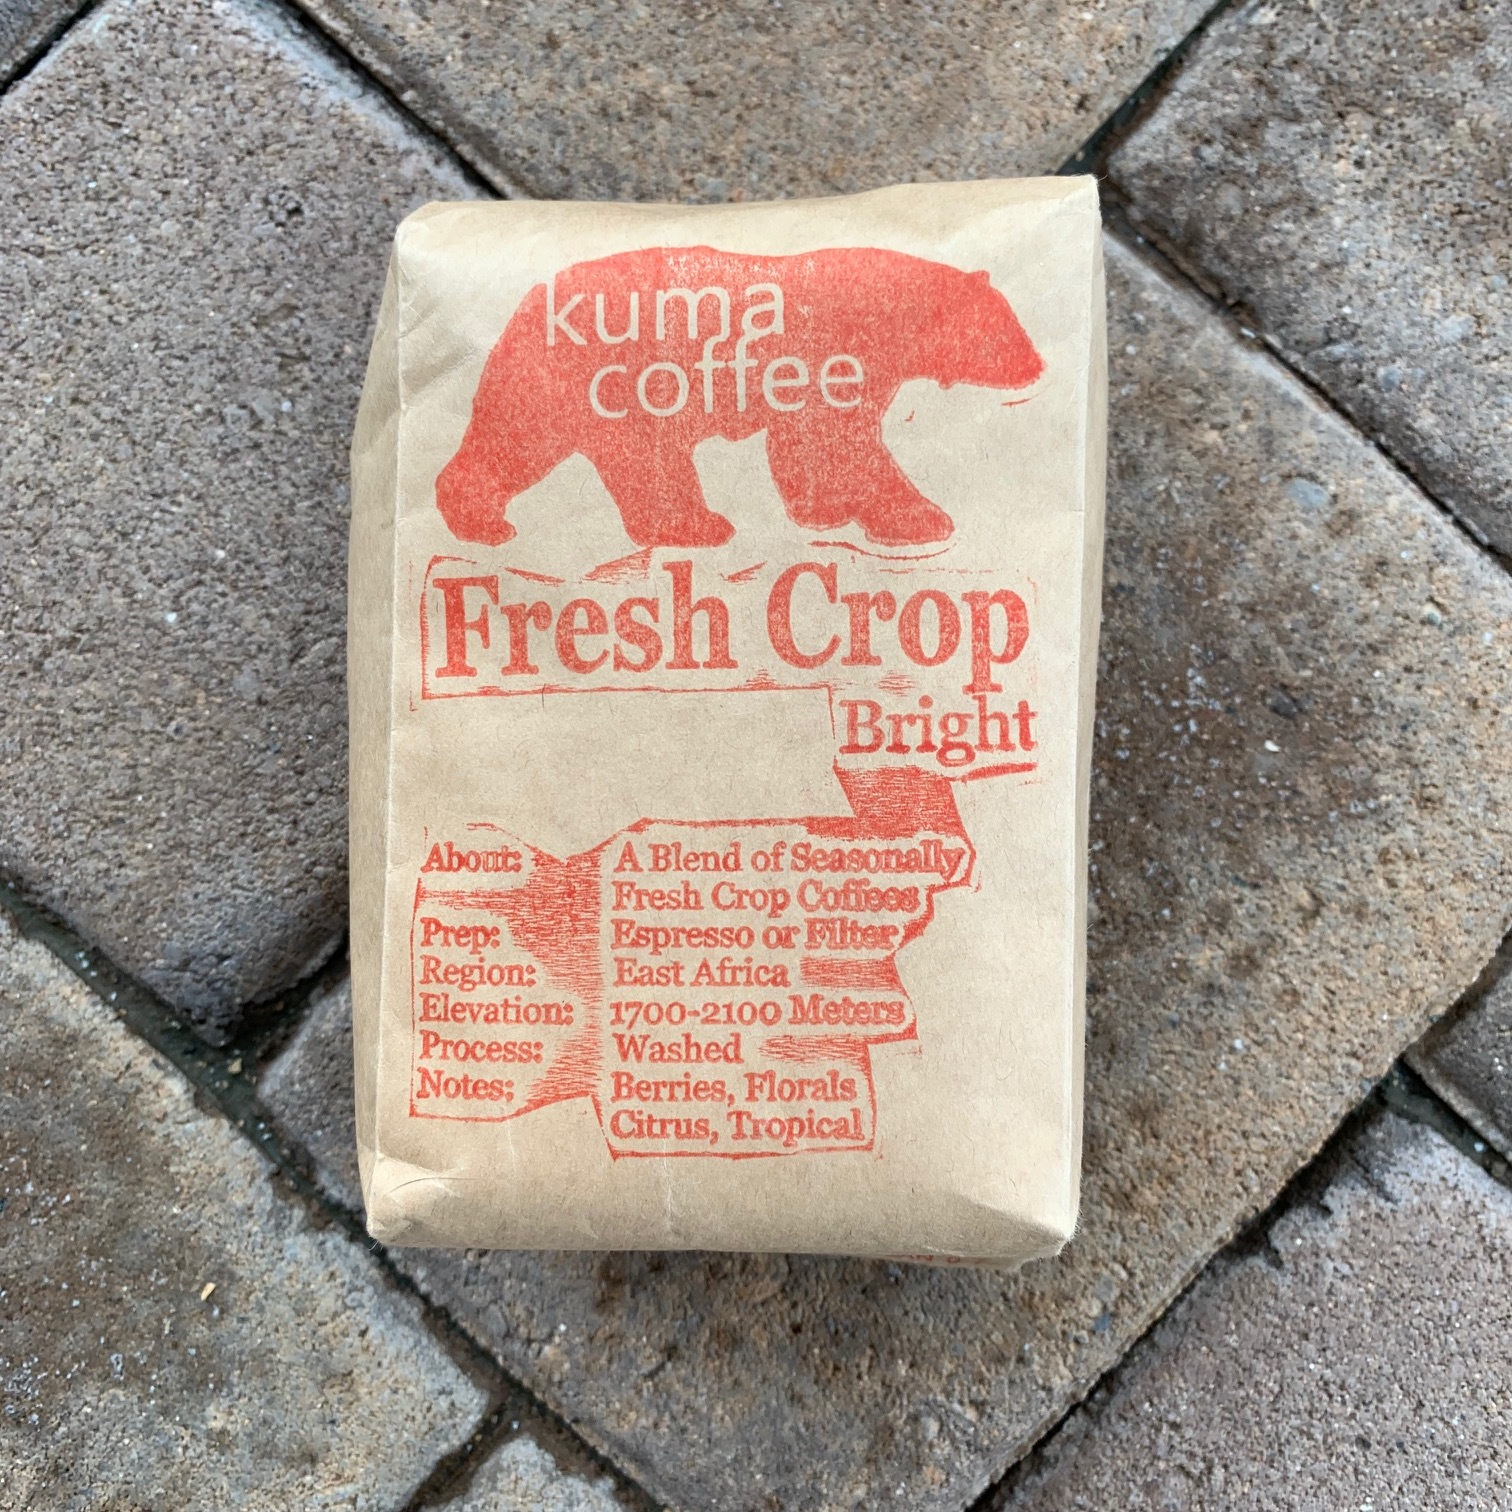 Kuma Coffee Fresh Crop Bright.jpg